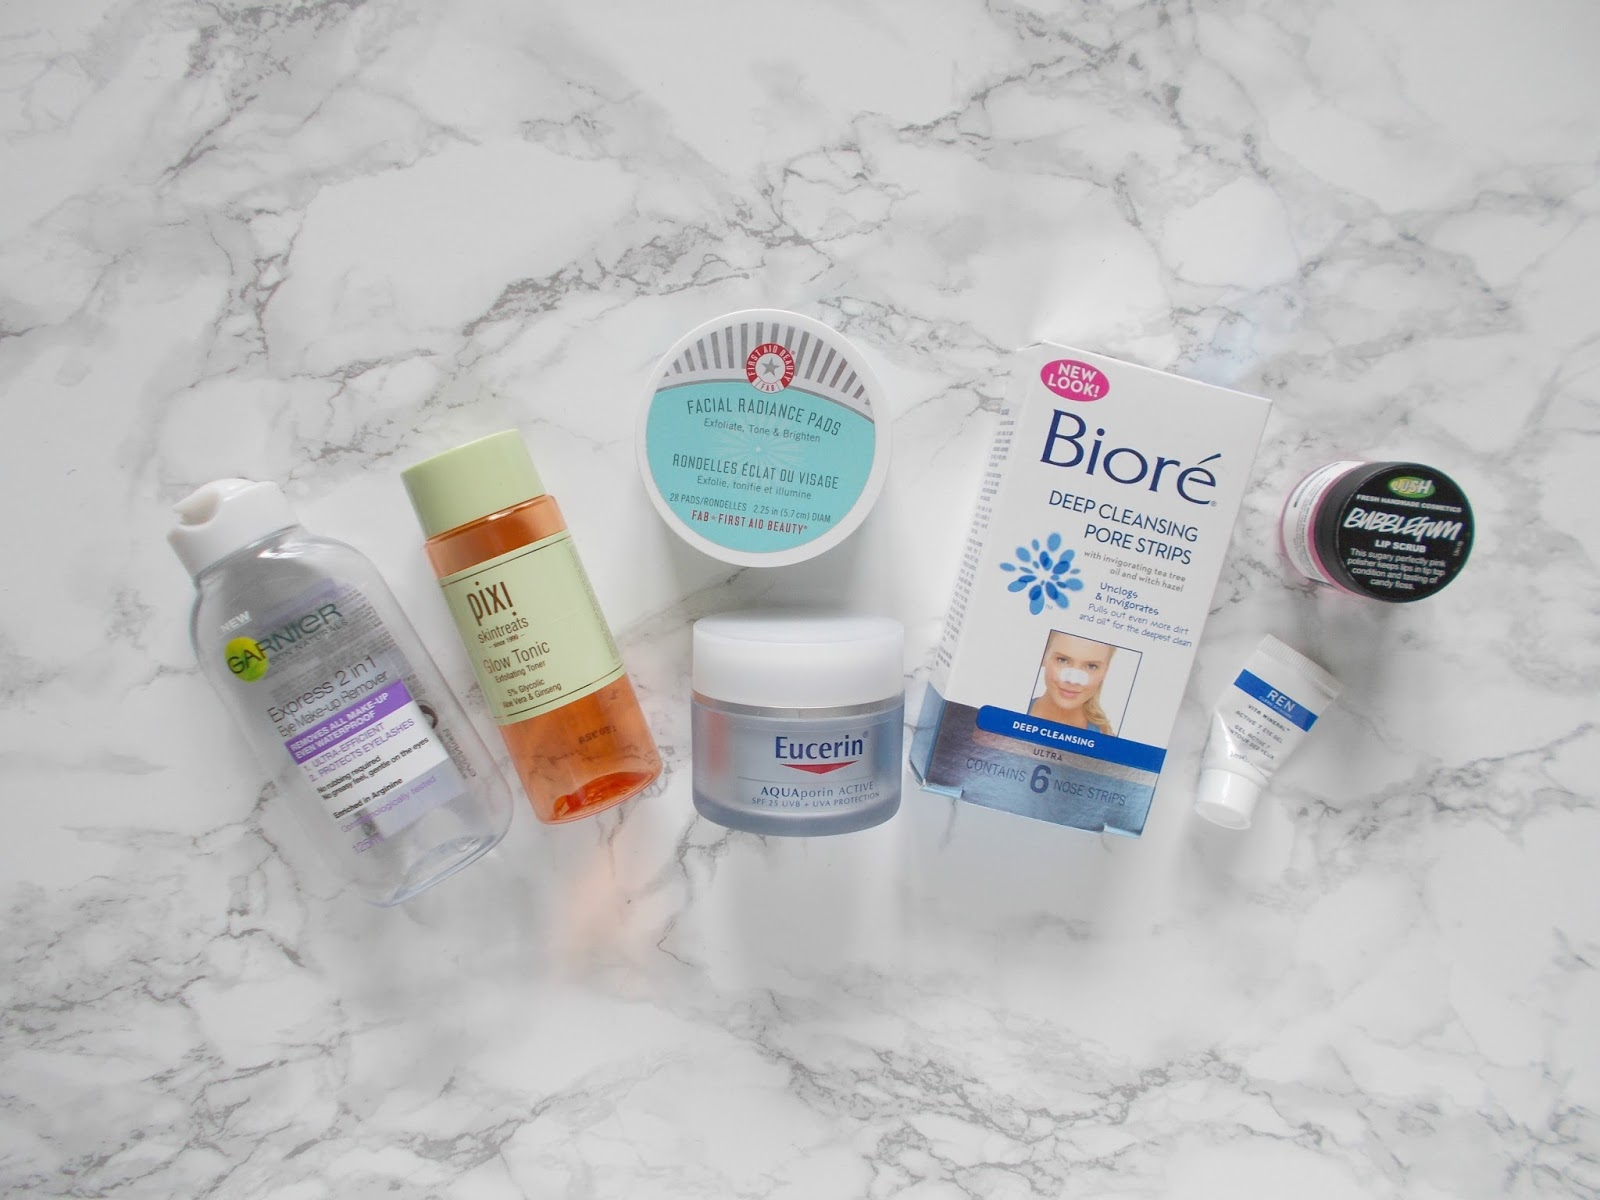 product empties skincare pixi fab biore lush garnier eucerin